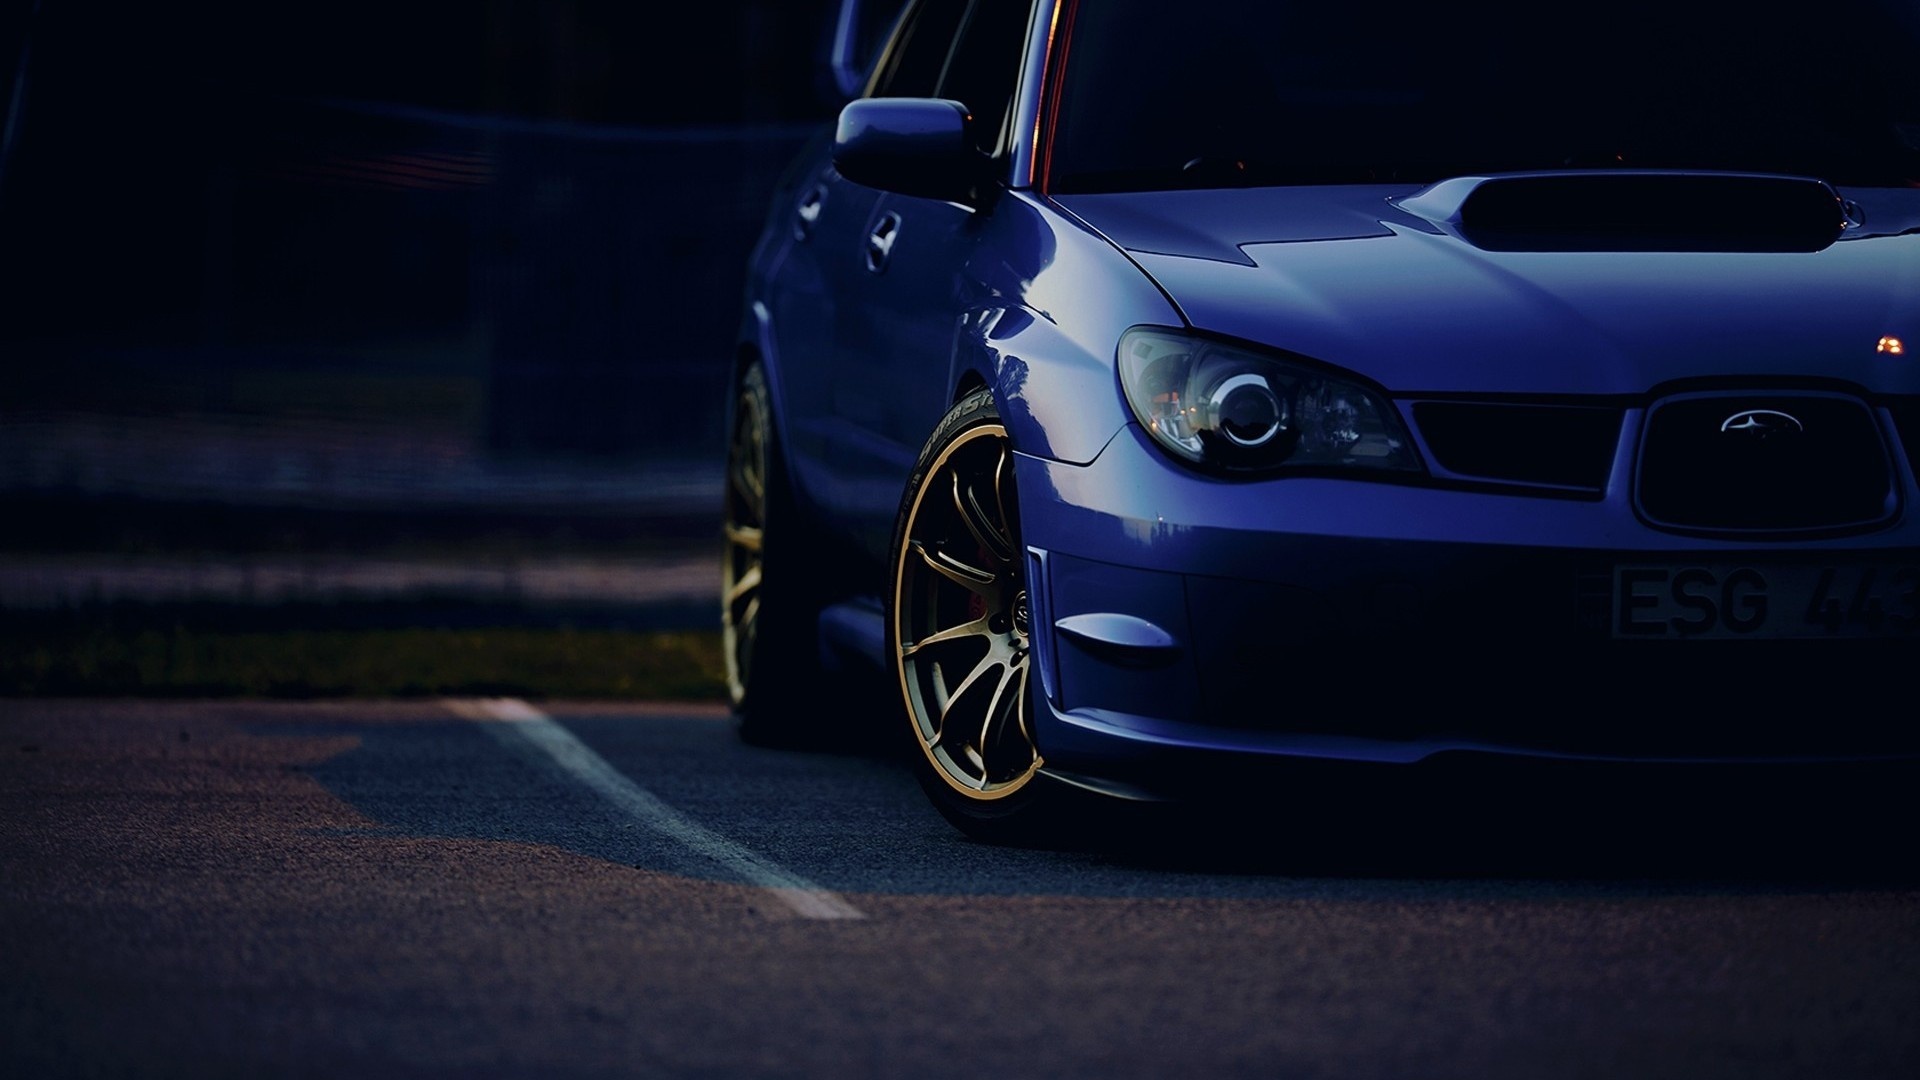 Best Image Subaru Impreza WRX STI Wallpaper